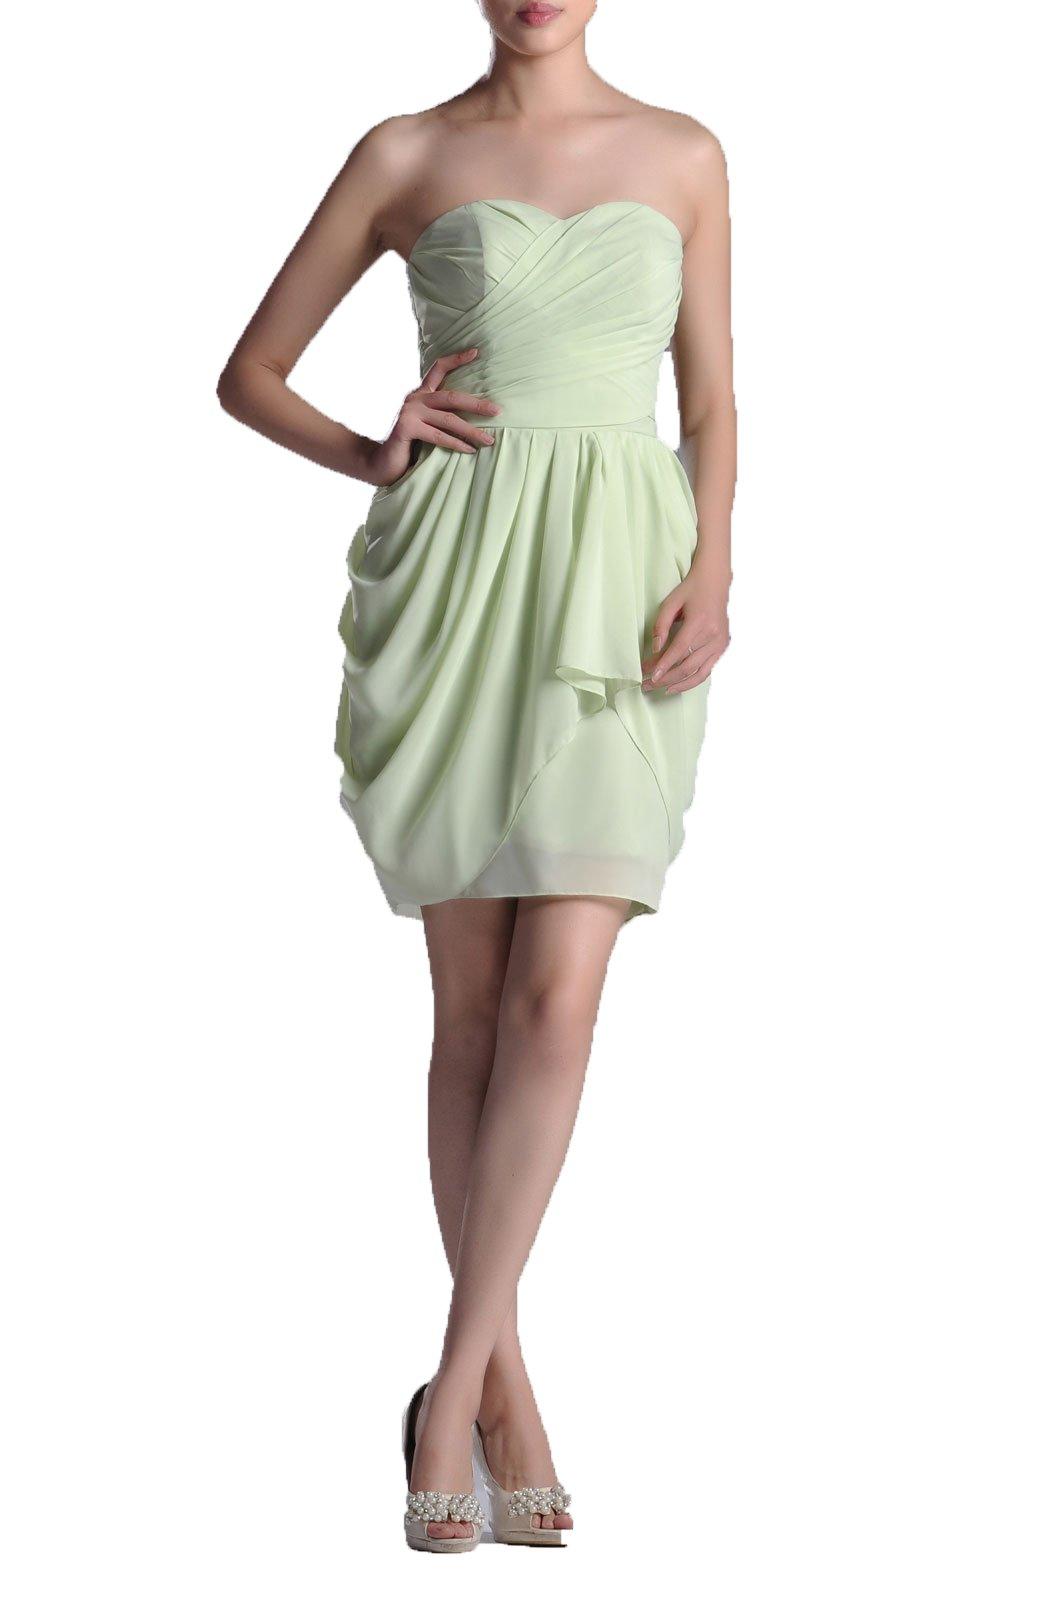 307853dd7a5f Adorona Special Occasion A-line Knee Length Strapless Cocktail Chiffon Bridesmaid  Dress Short, Color Fuschia,Customized